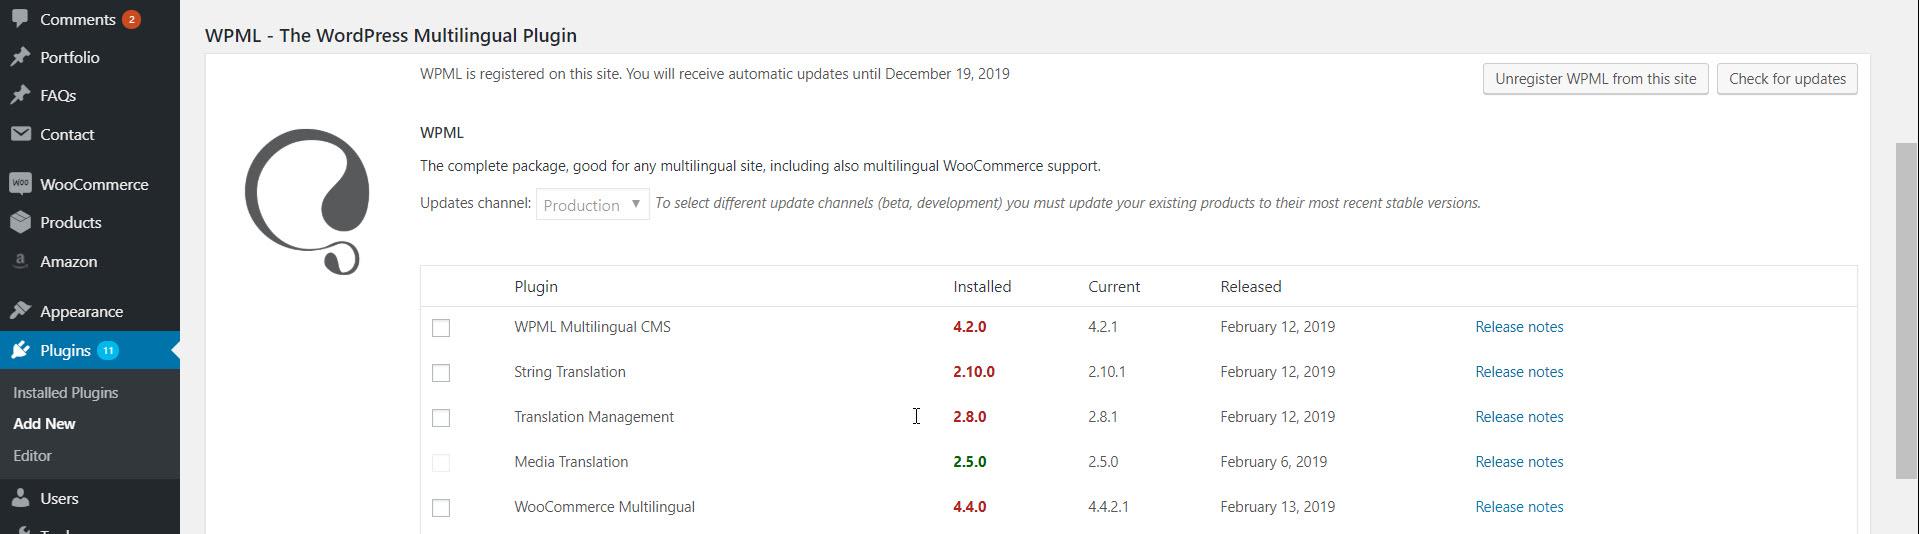 wpml plugins latest(14feb19).jpg